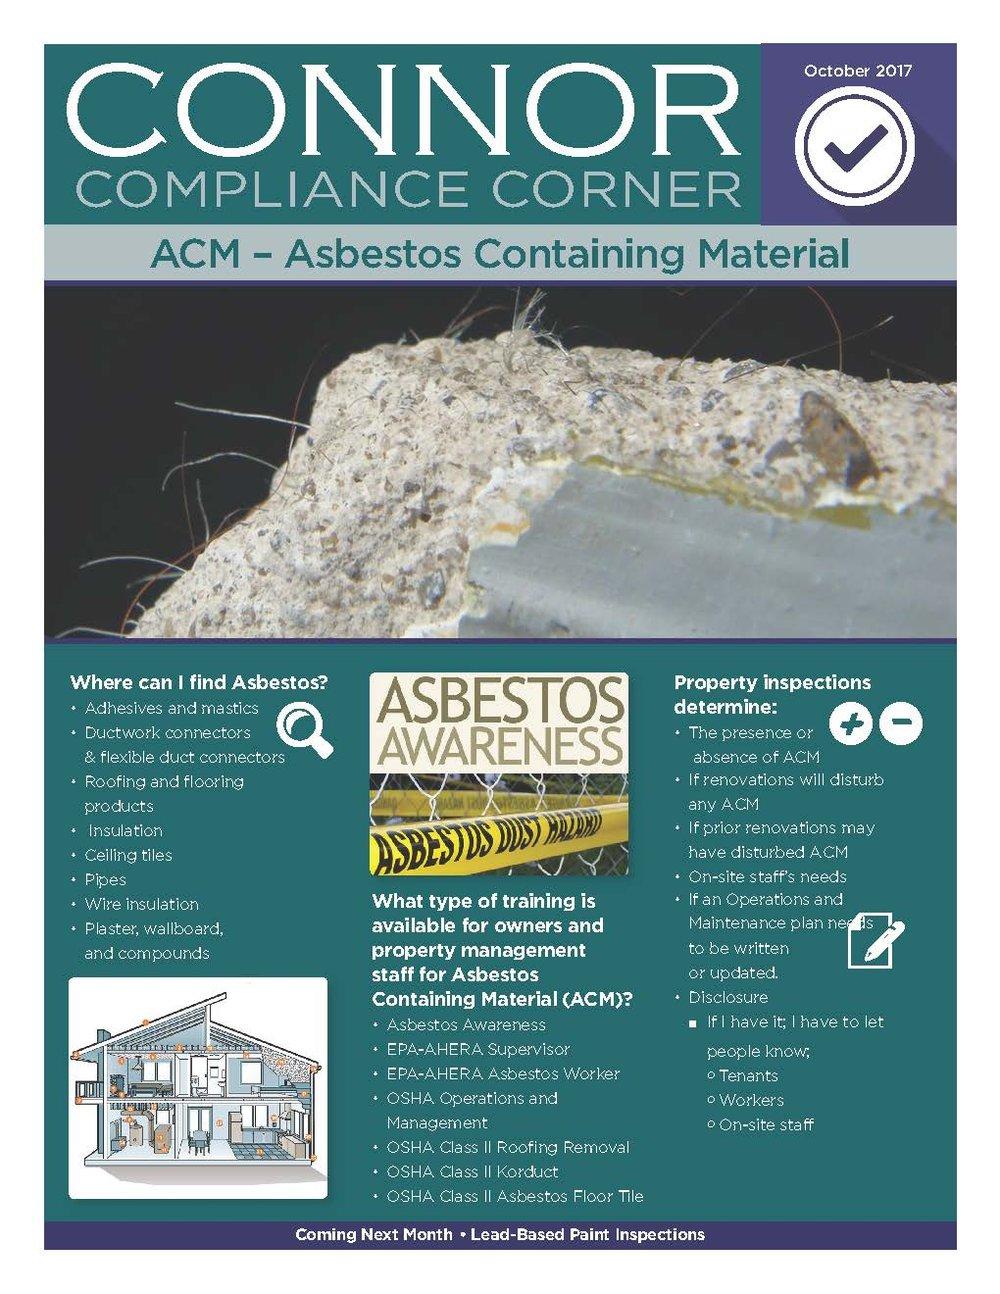 Compliance_Corner_Asbestos_FINAL_Page_1.jpg